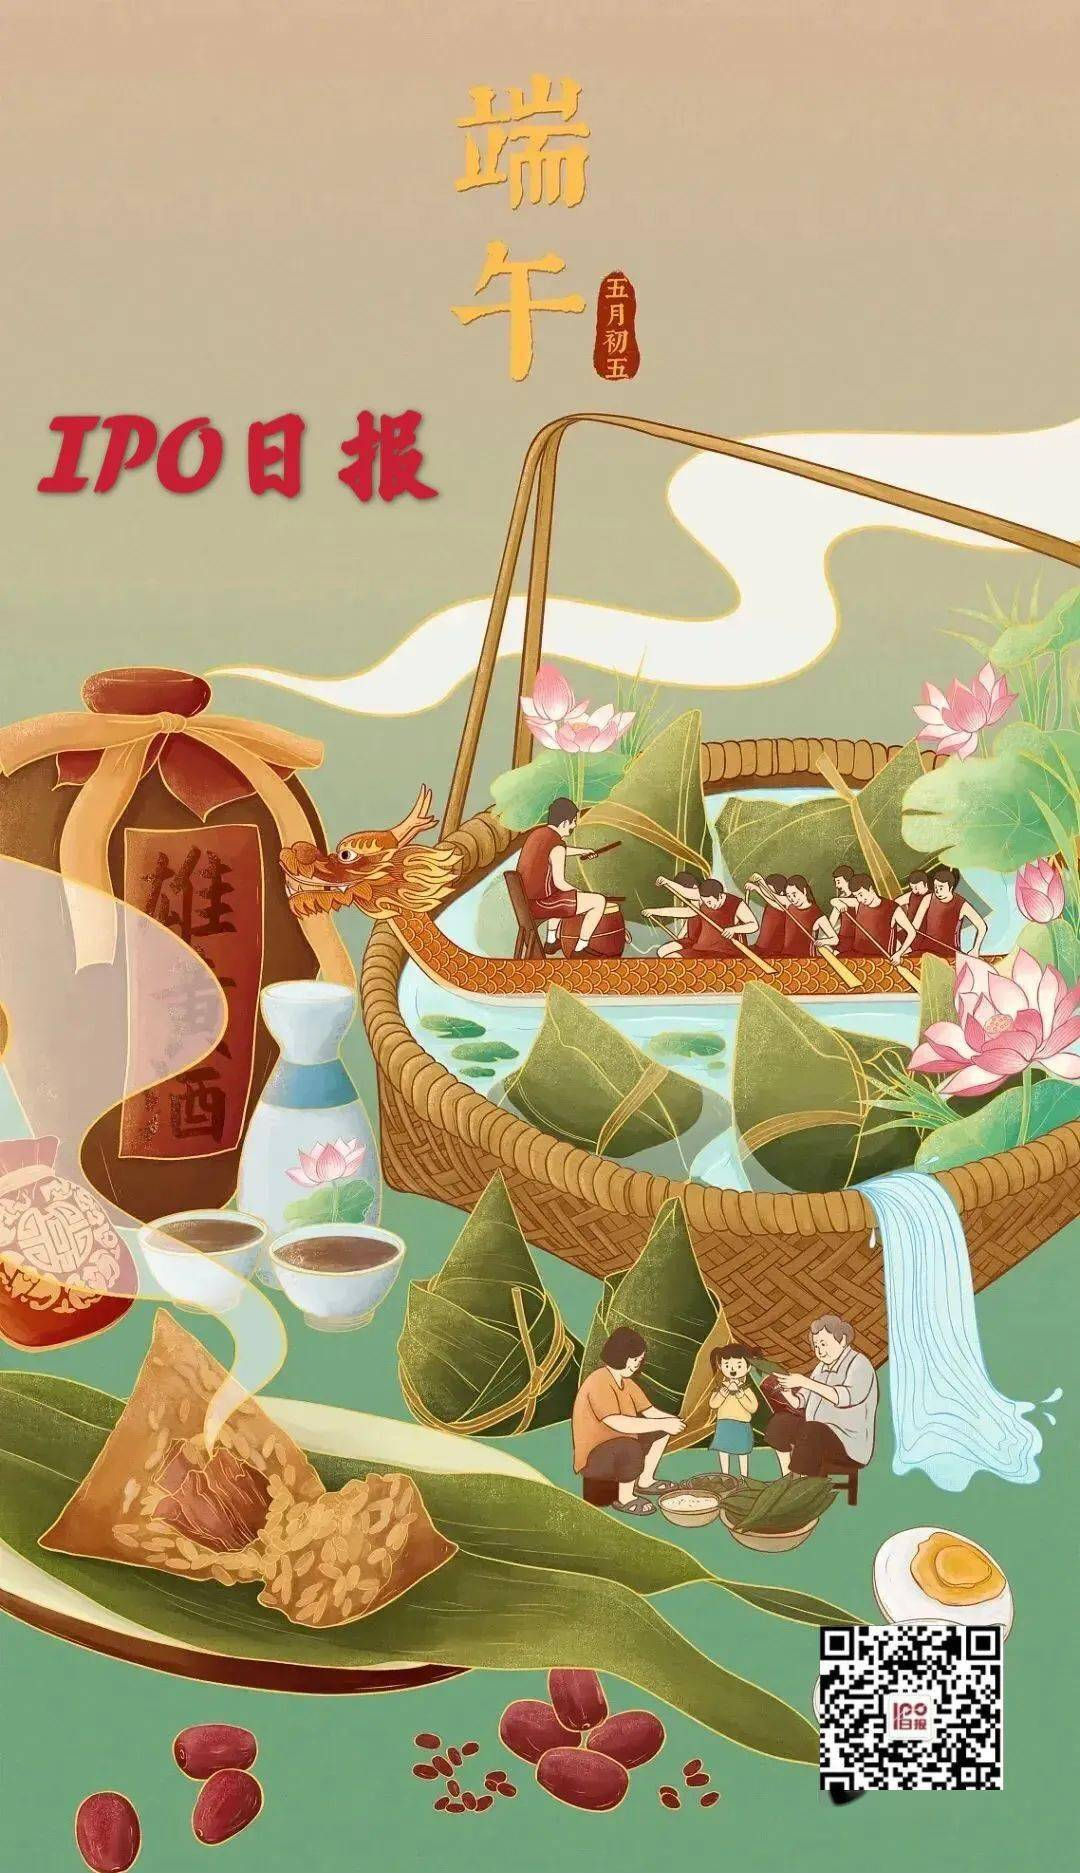 IPO日报祝端午节快乐!